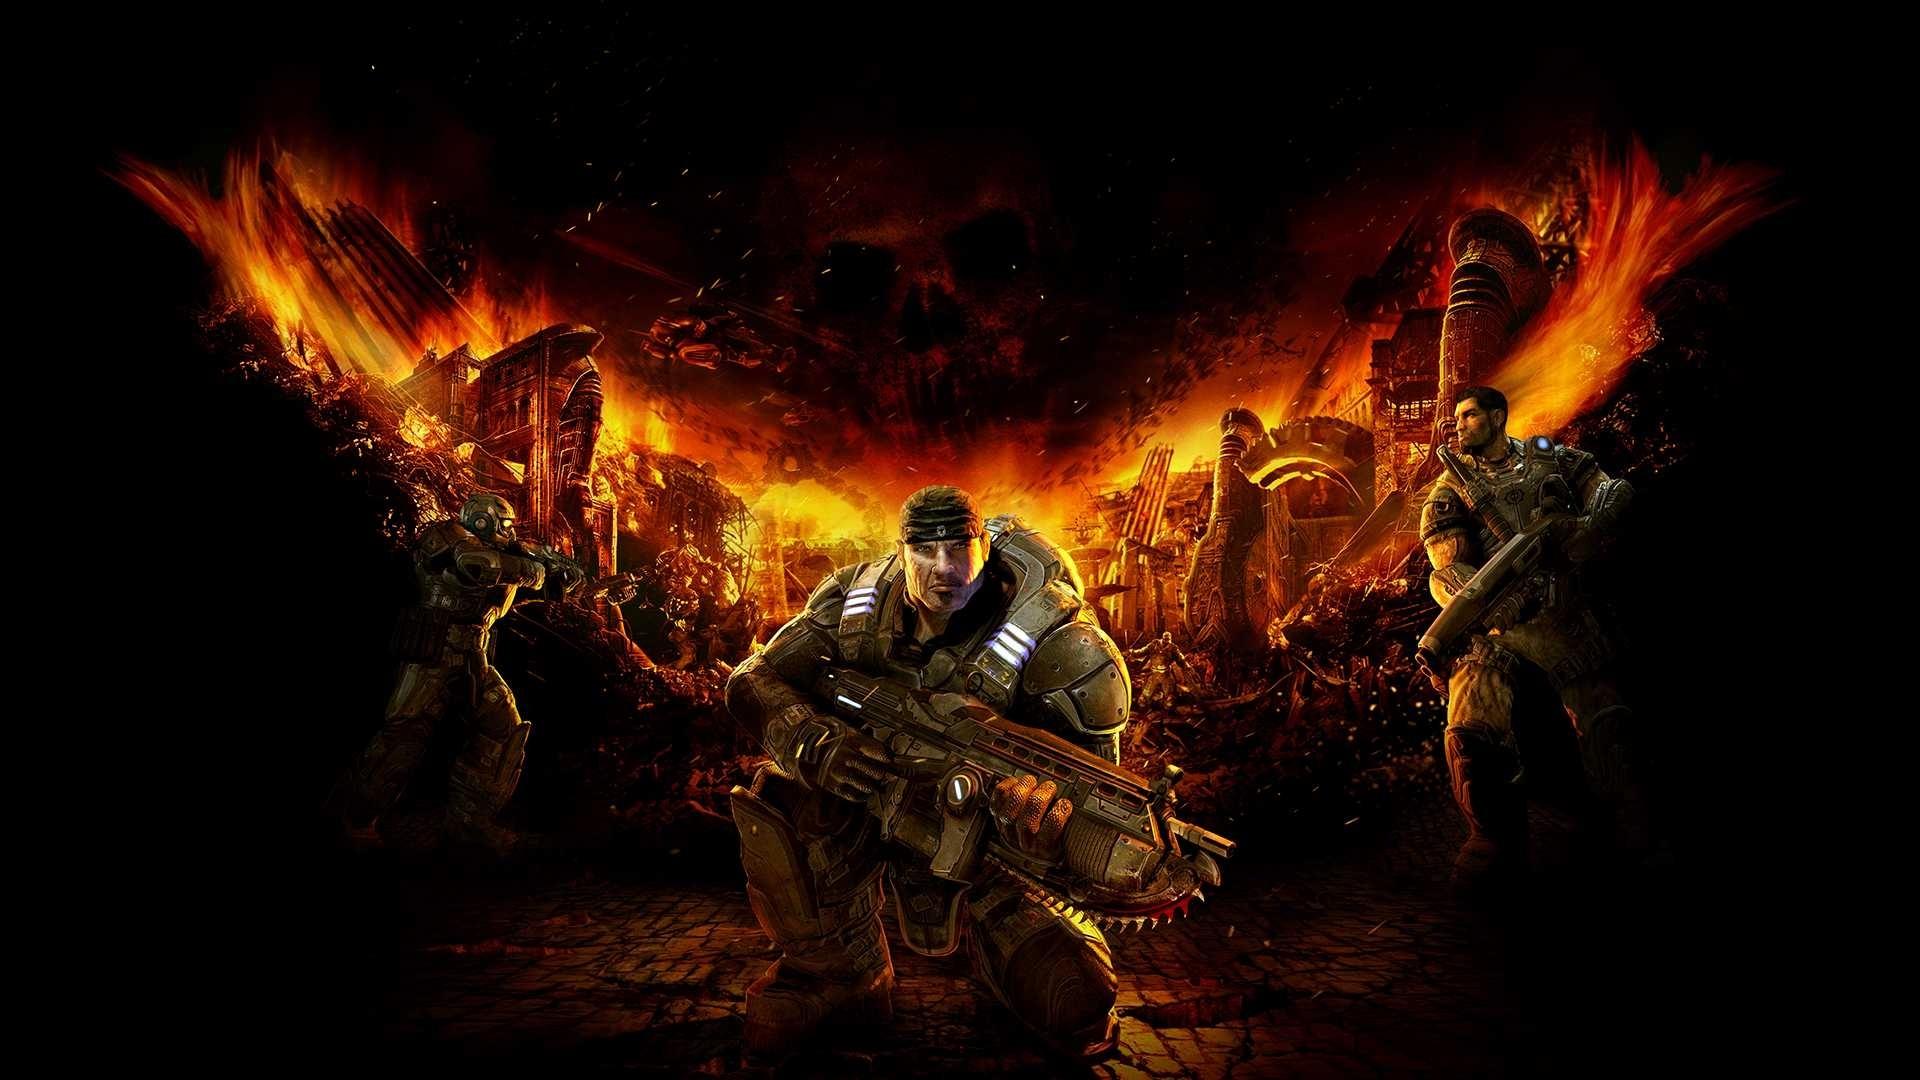 Gears Of War free photo